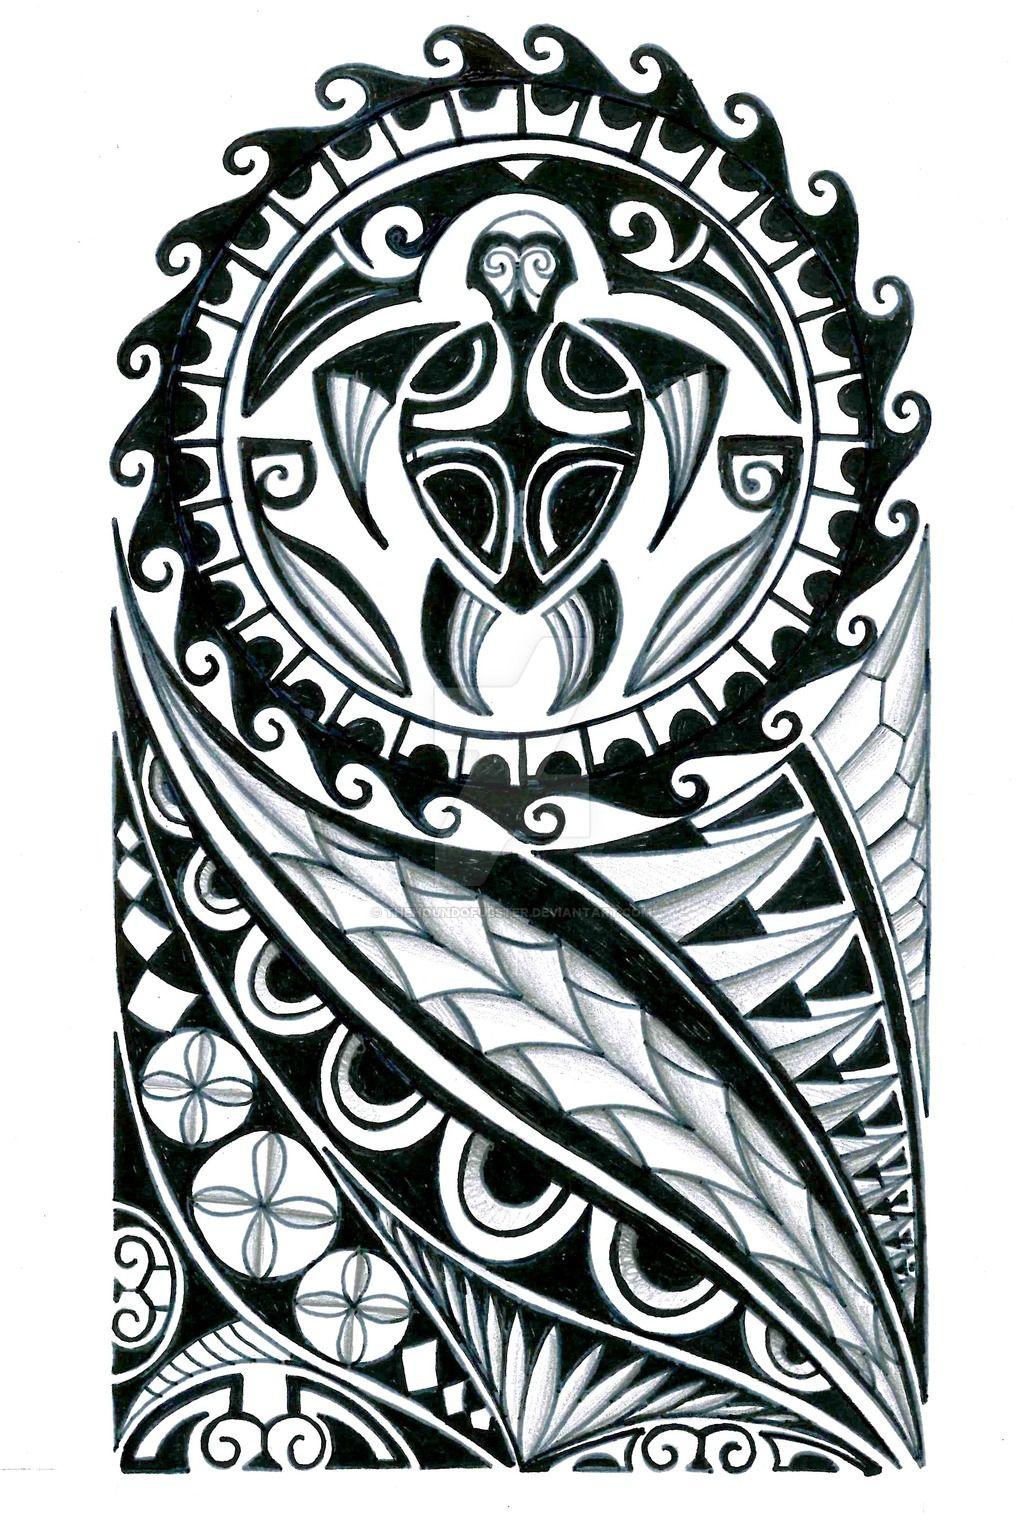 5472575cb Polynesian Designs, Polynesian Tattoo Sleeve, Maori Designs, Samoan Designs,  Polynesian Tribal,